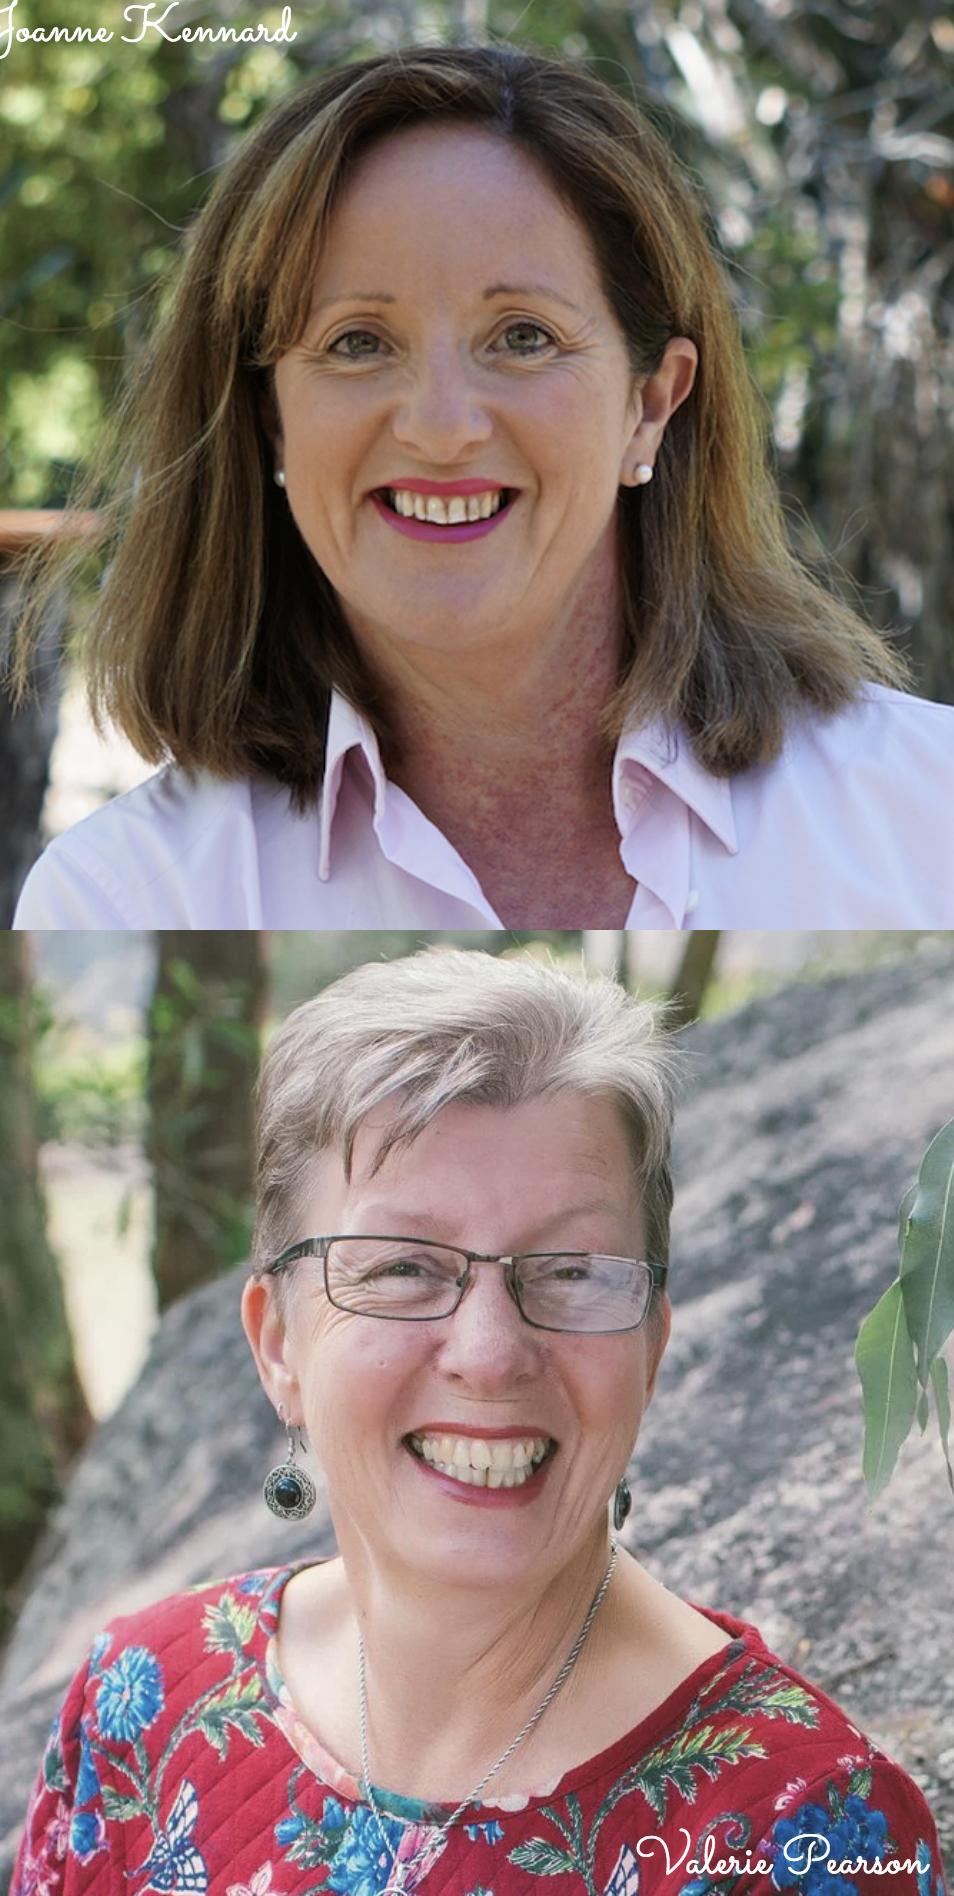 Valerie Pearson & Joanne Kennard